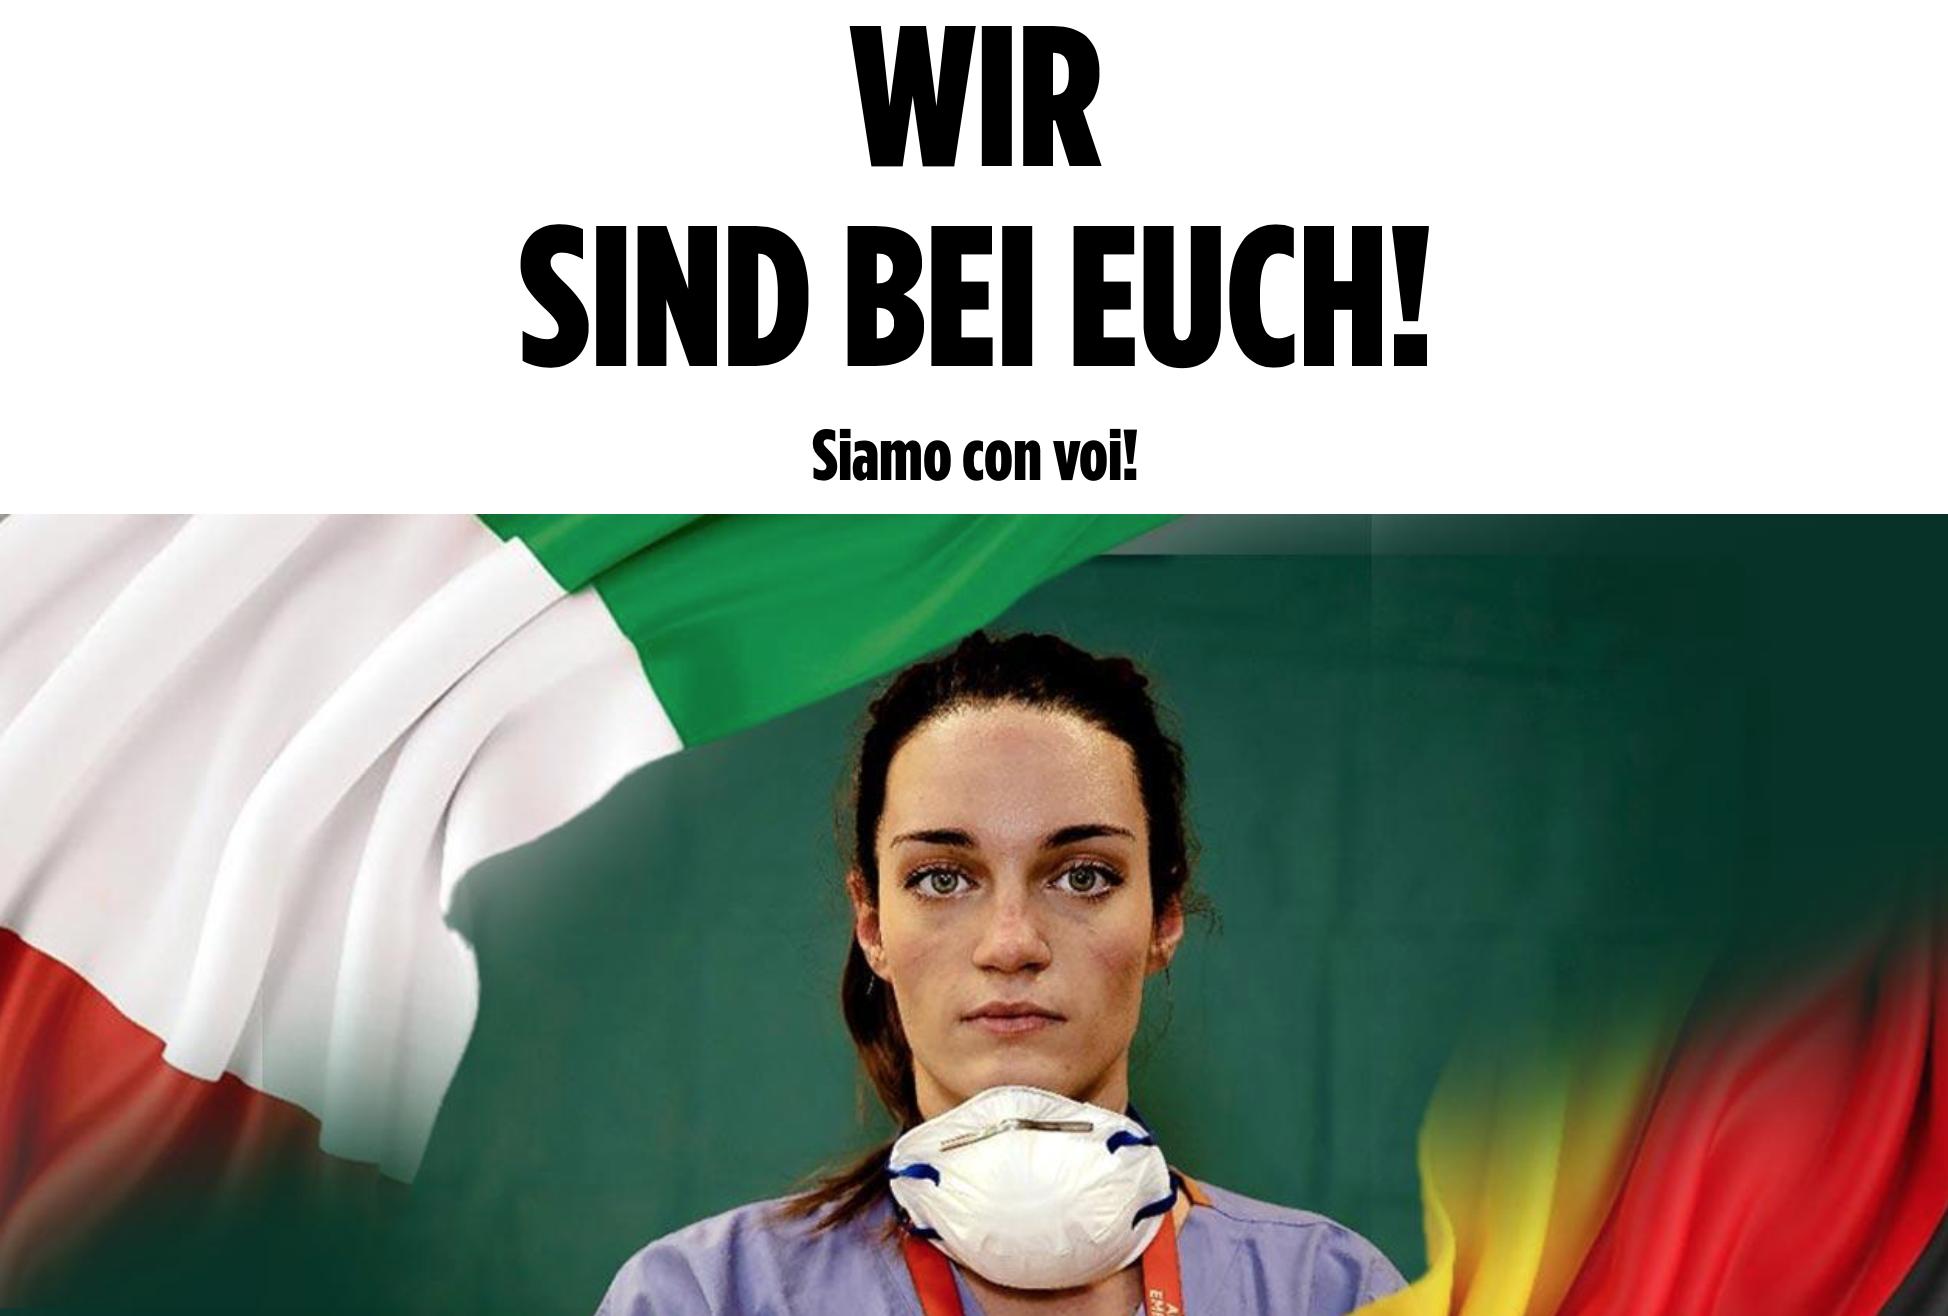 StartupItalia! - cover